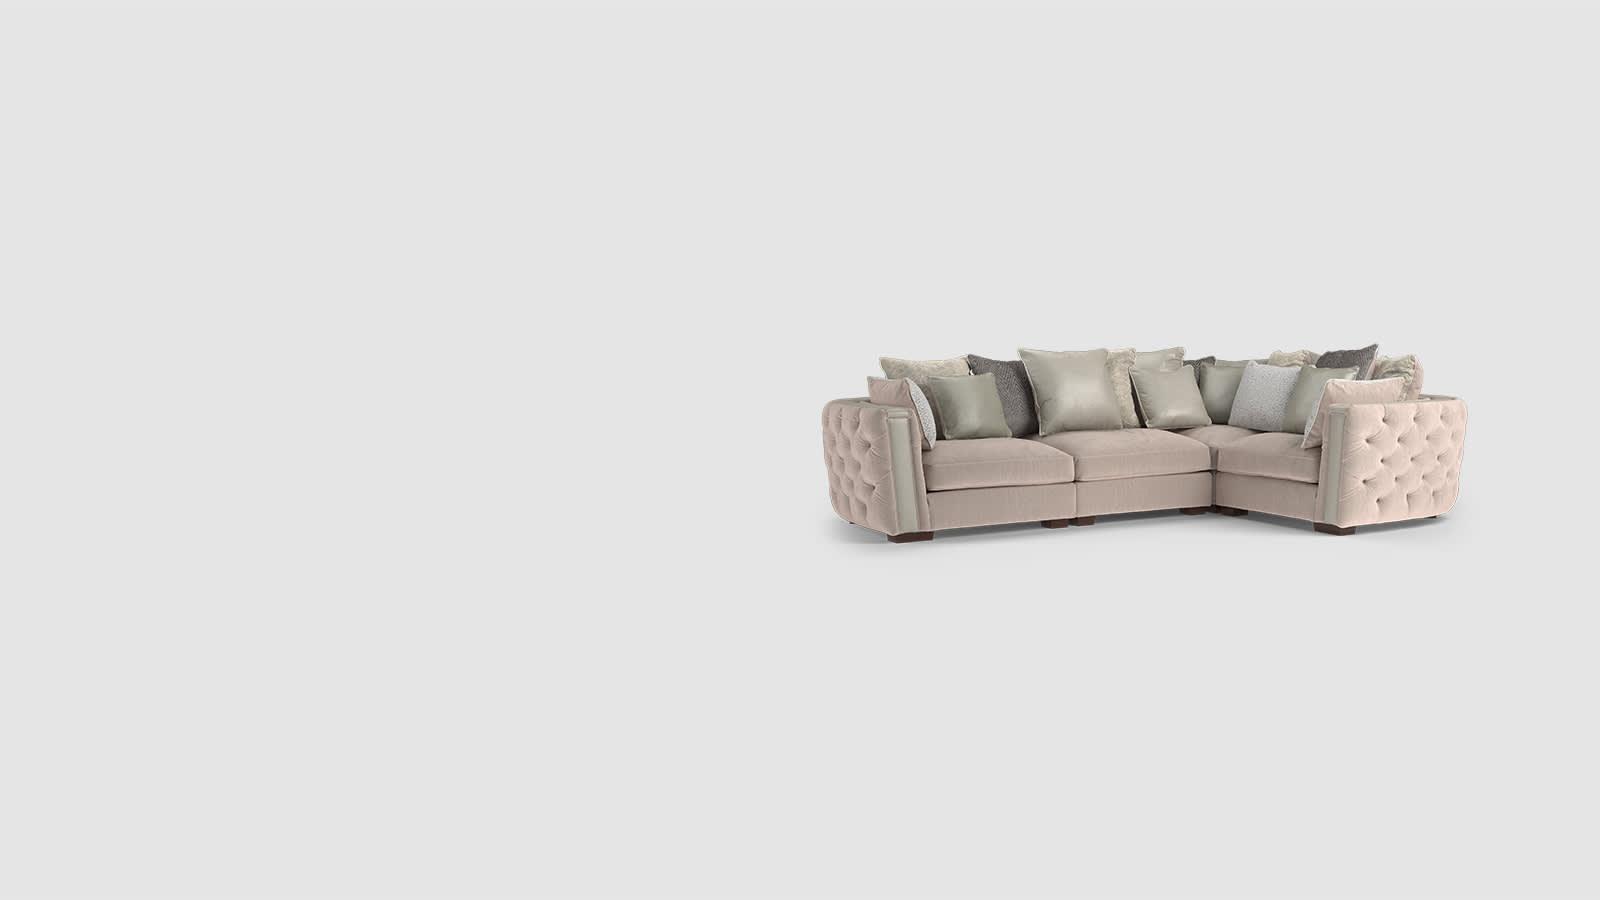 Sofology boodles corner sofa